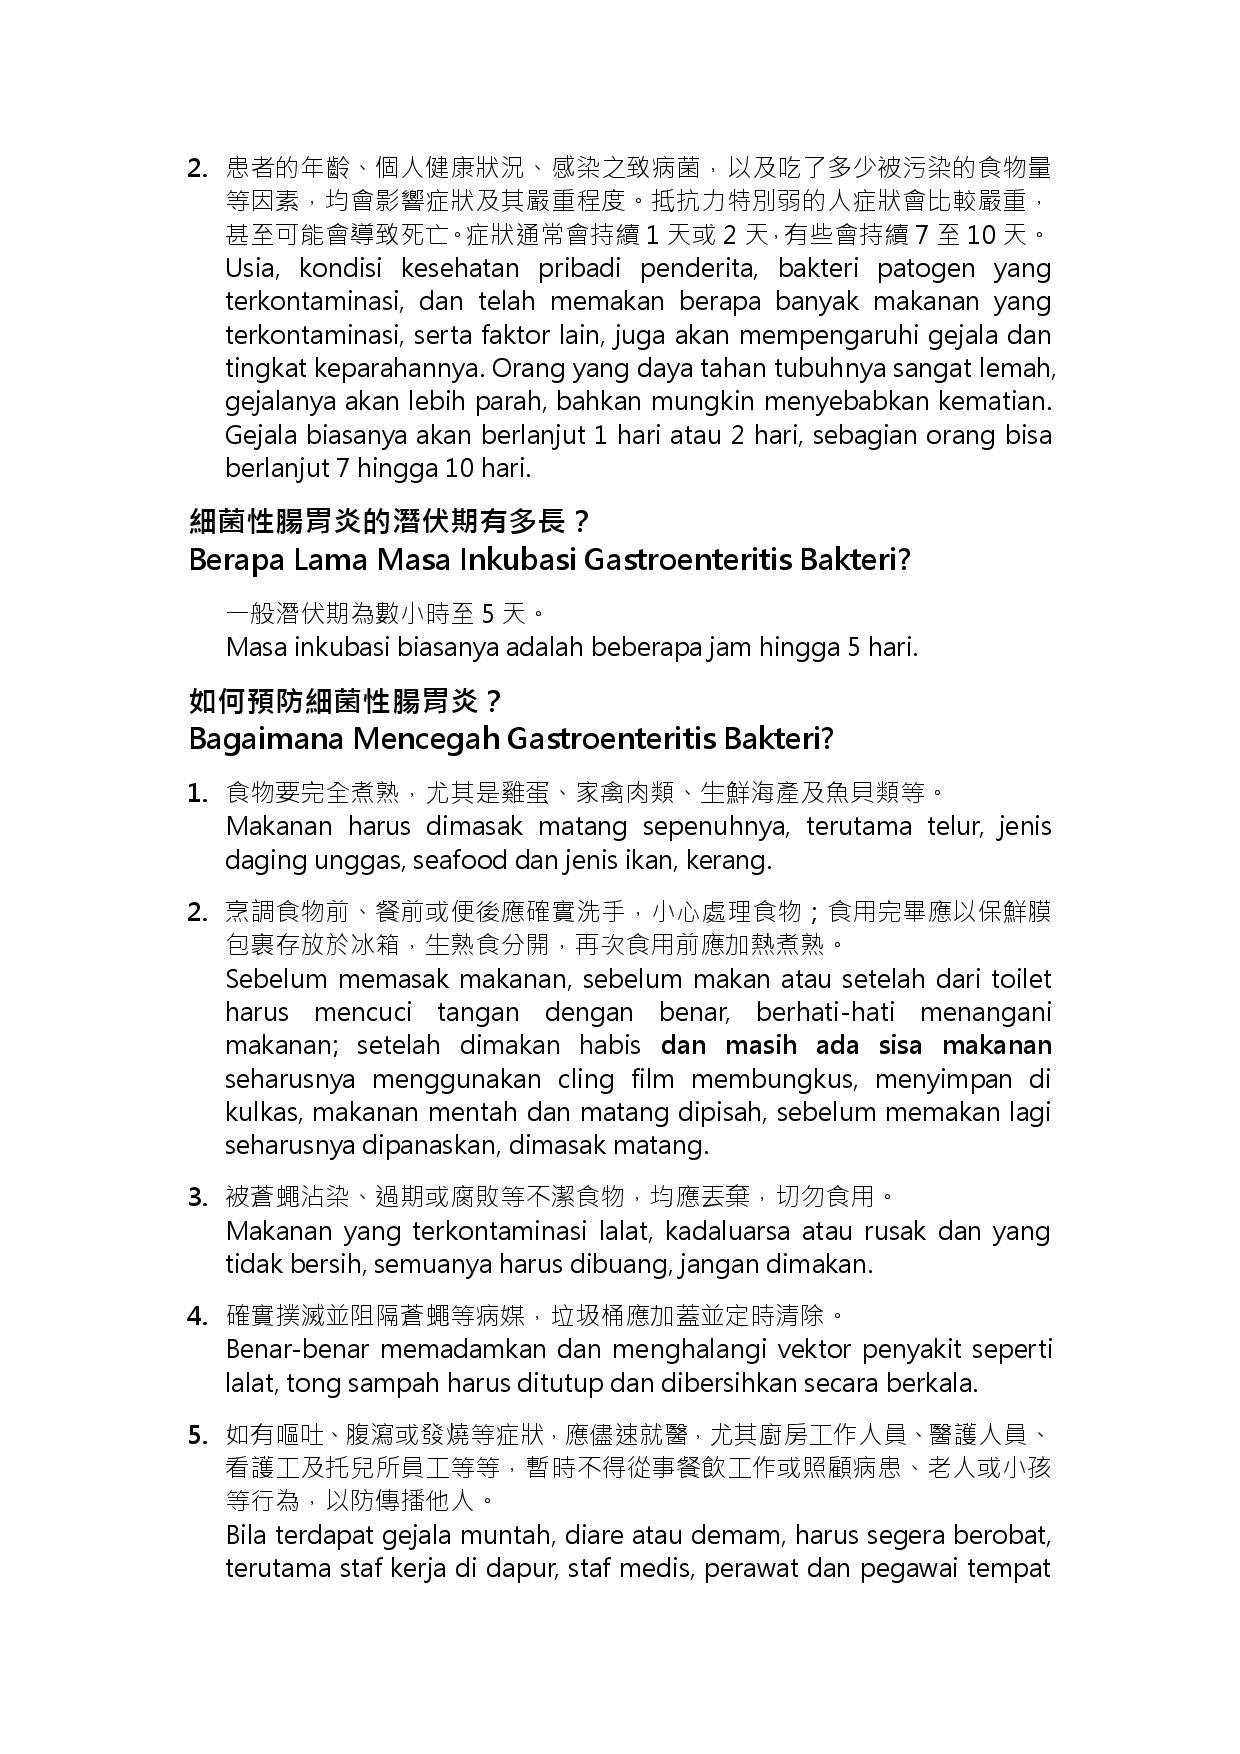 詳如附件【Klik】Mencegah Gastroenteritis Bakteri(Halaman 2)預防細菌性腸胃炎(印尼文)